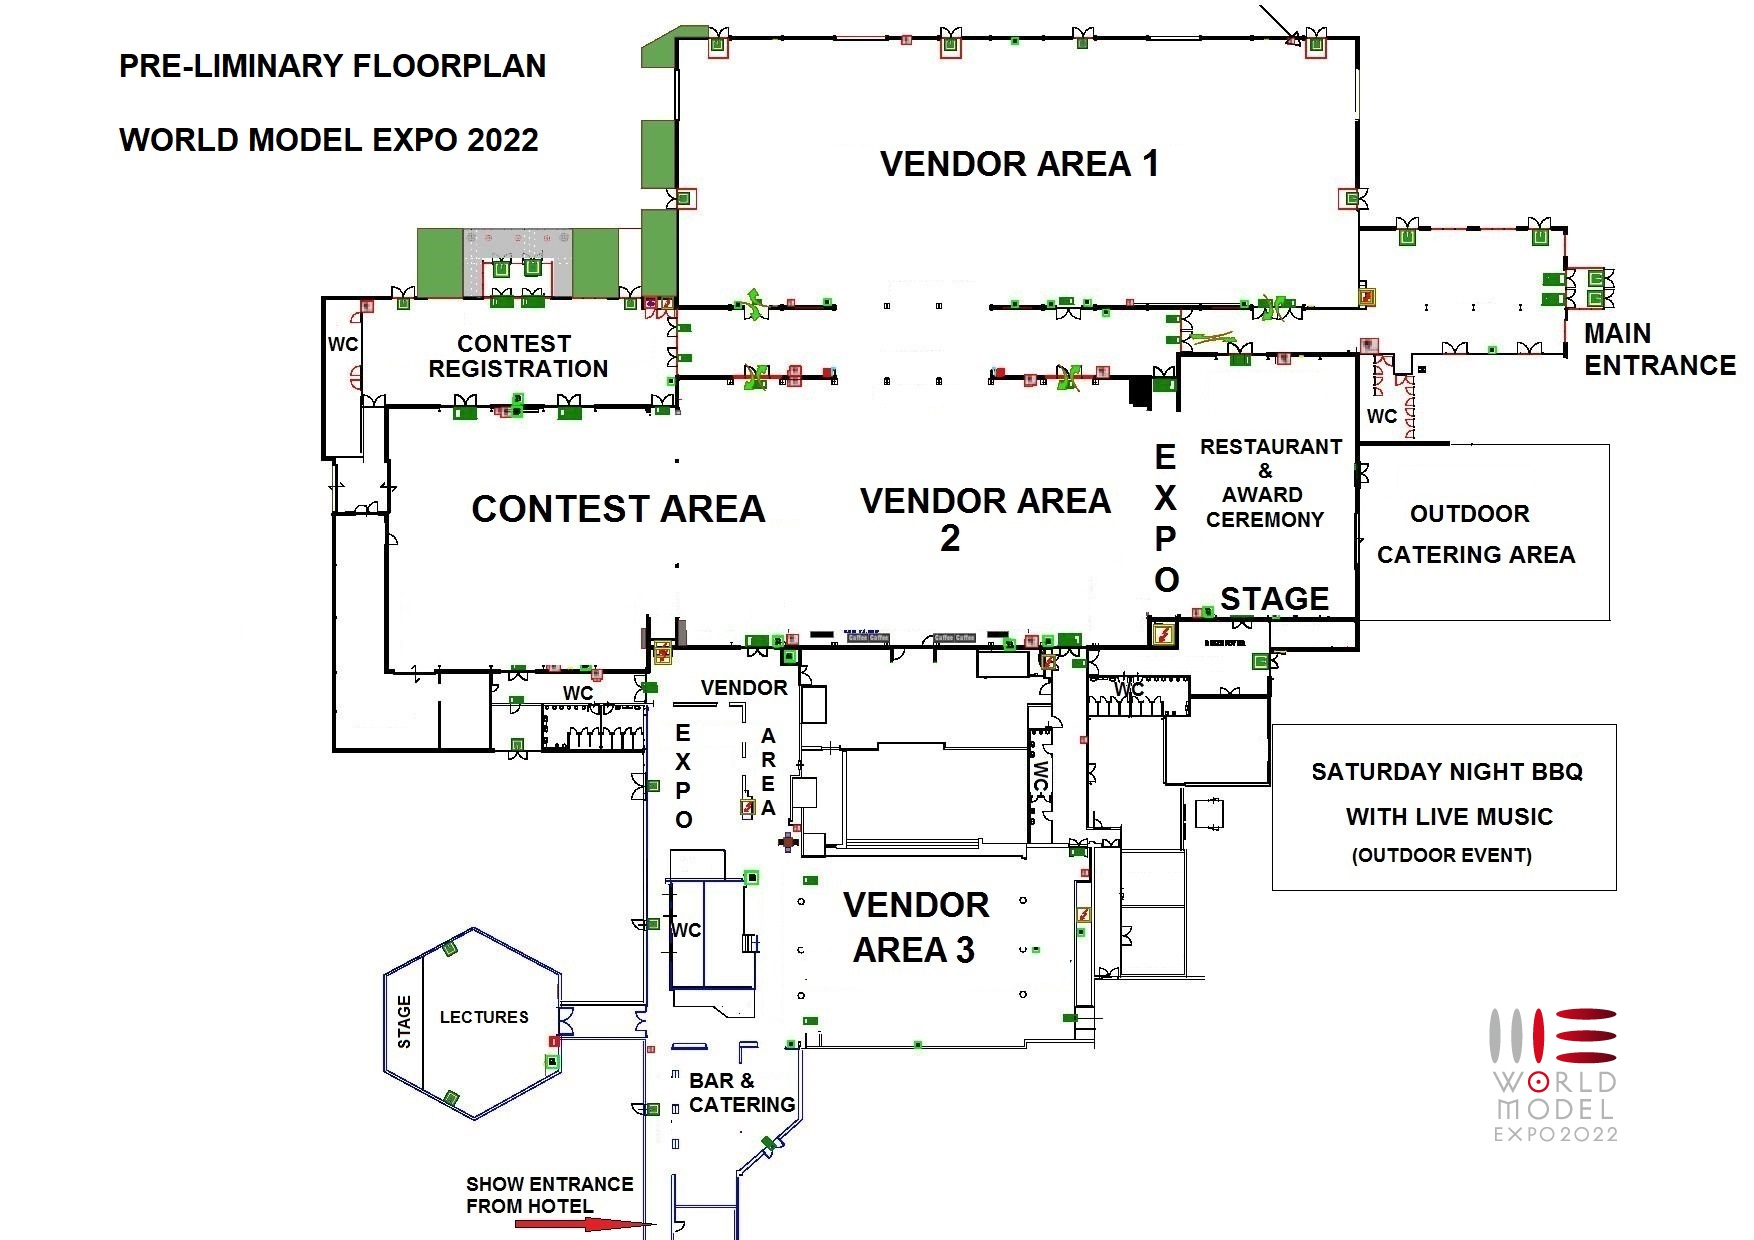 Floorplan World Model Expo Eindhoven 2022